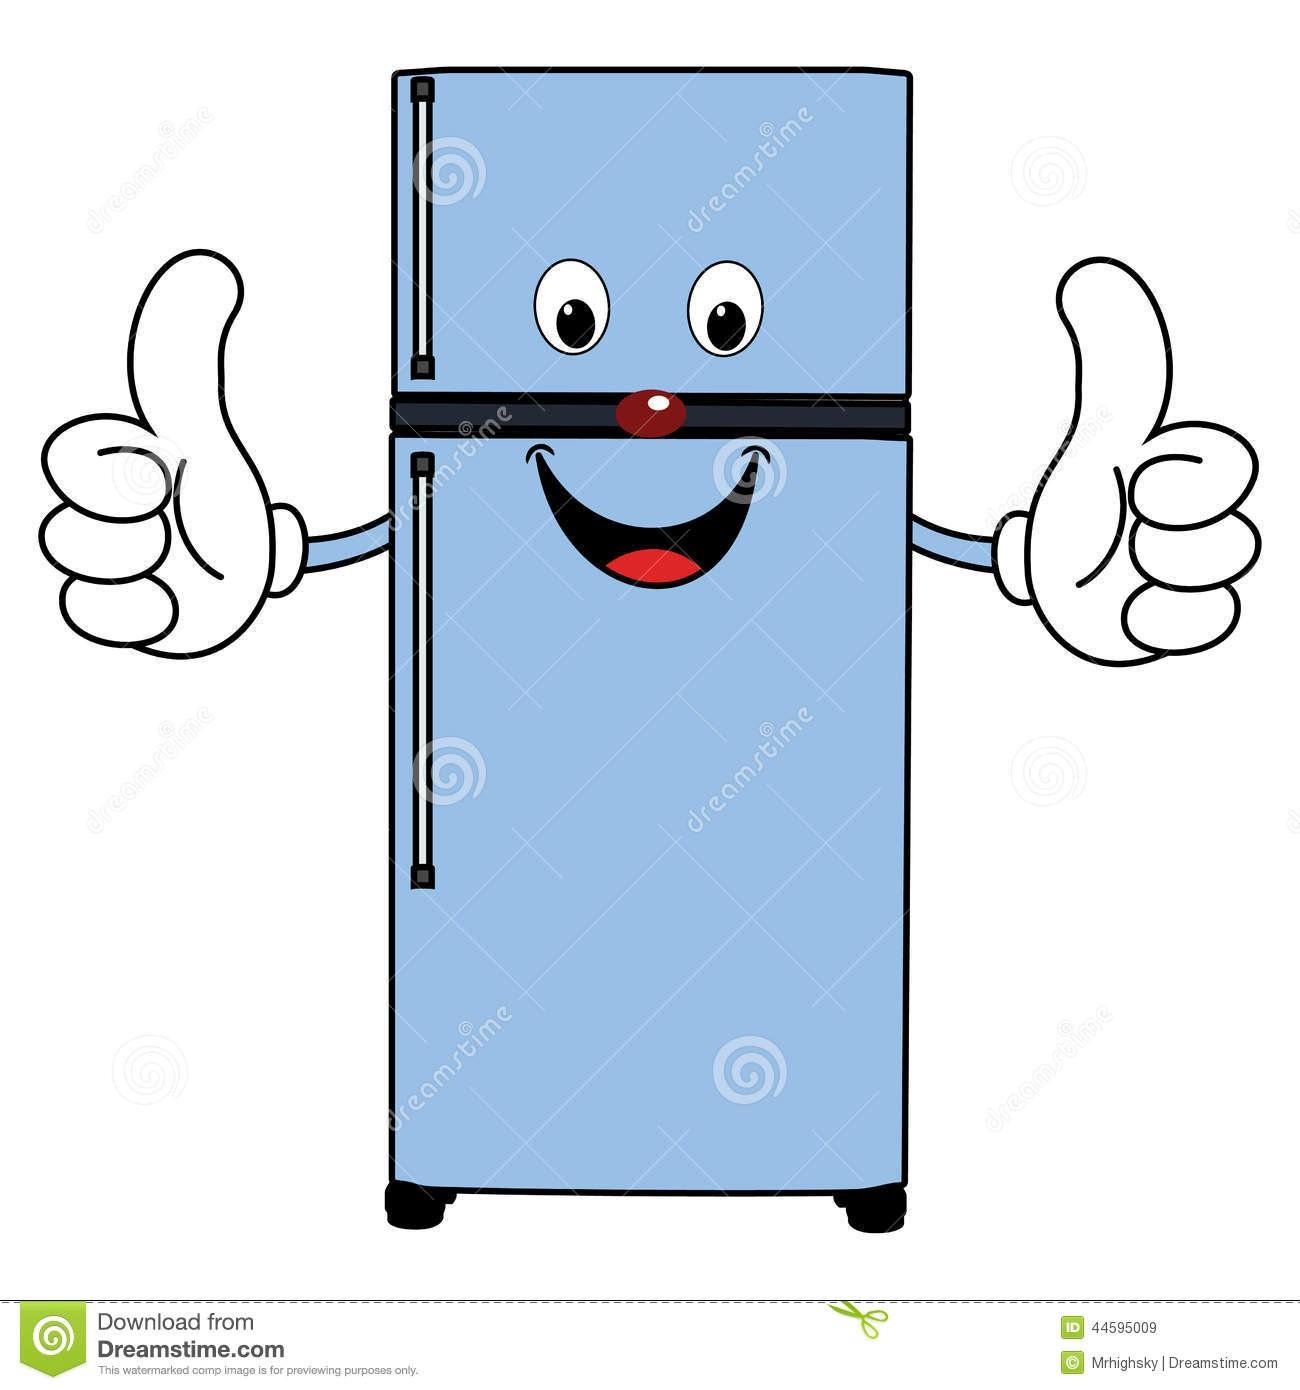 Clean fridge clipart clip Refrigerator Clipart | Free download best Refrigerator Clipart on ... clip